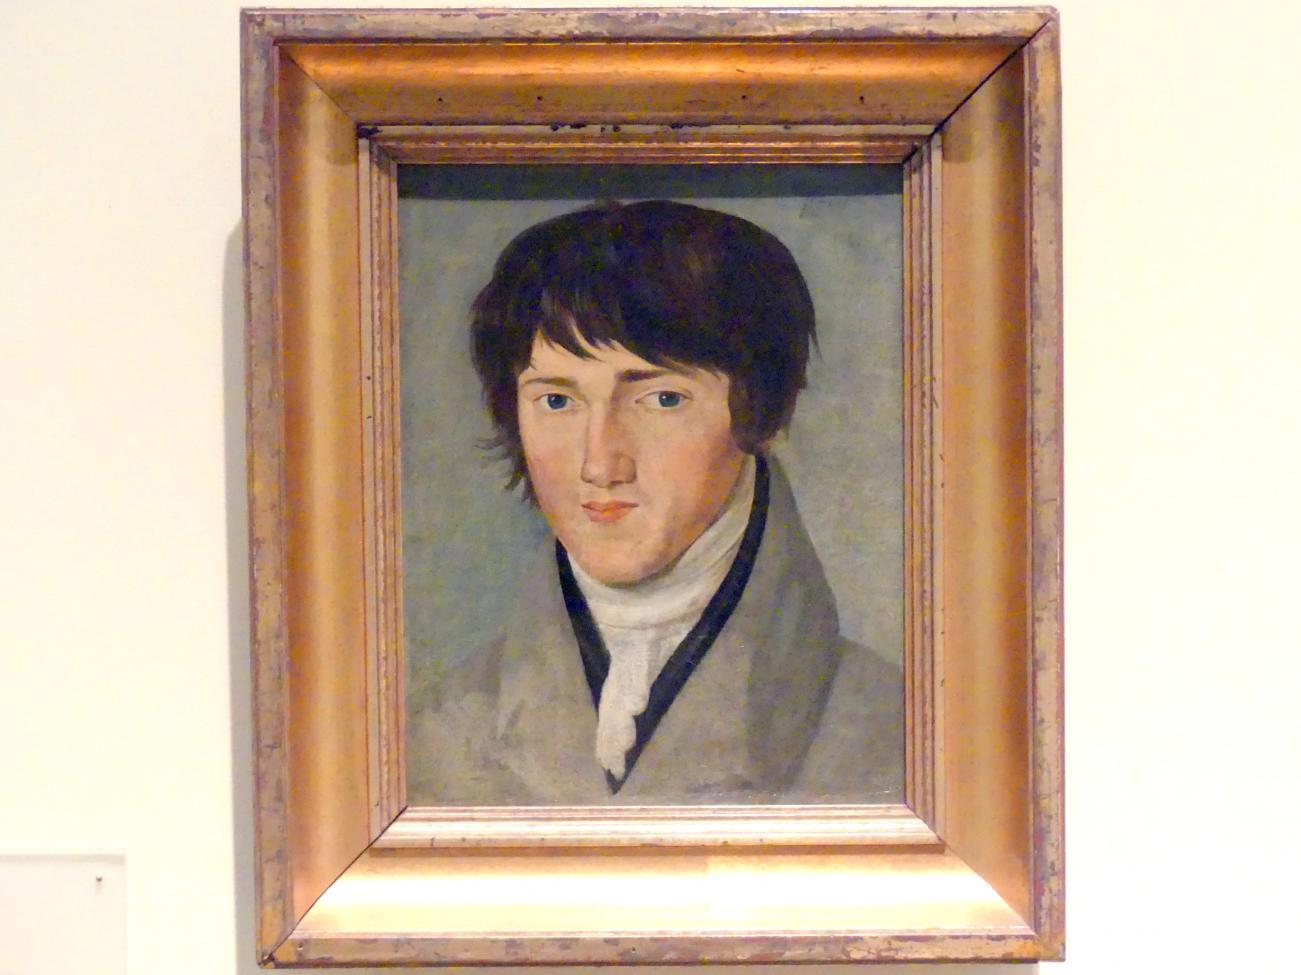 Franz Pforr: Selbstbildnis, 1807